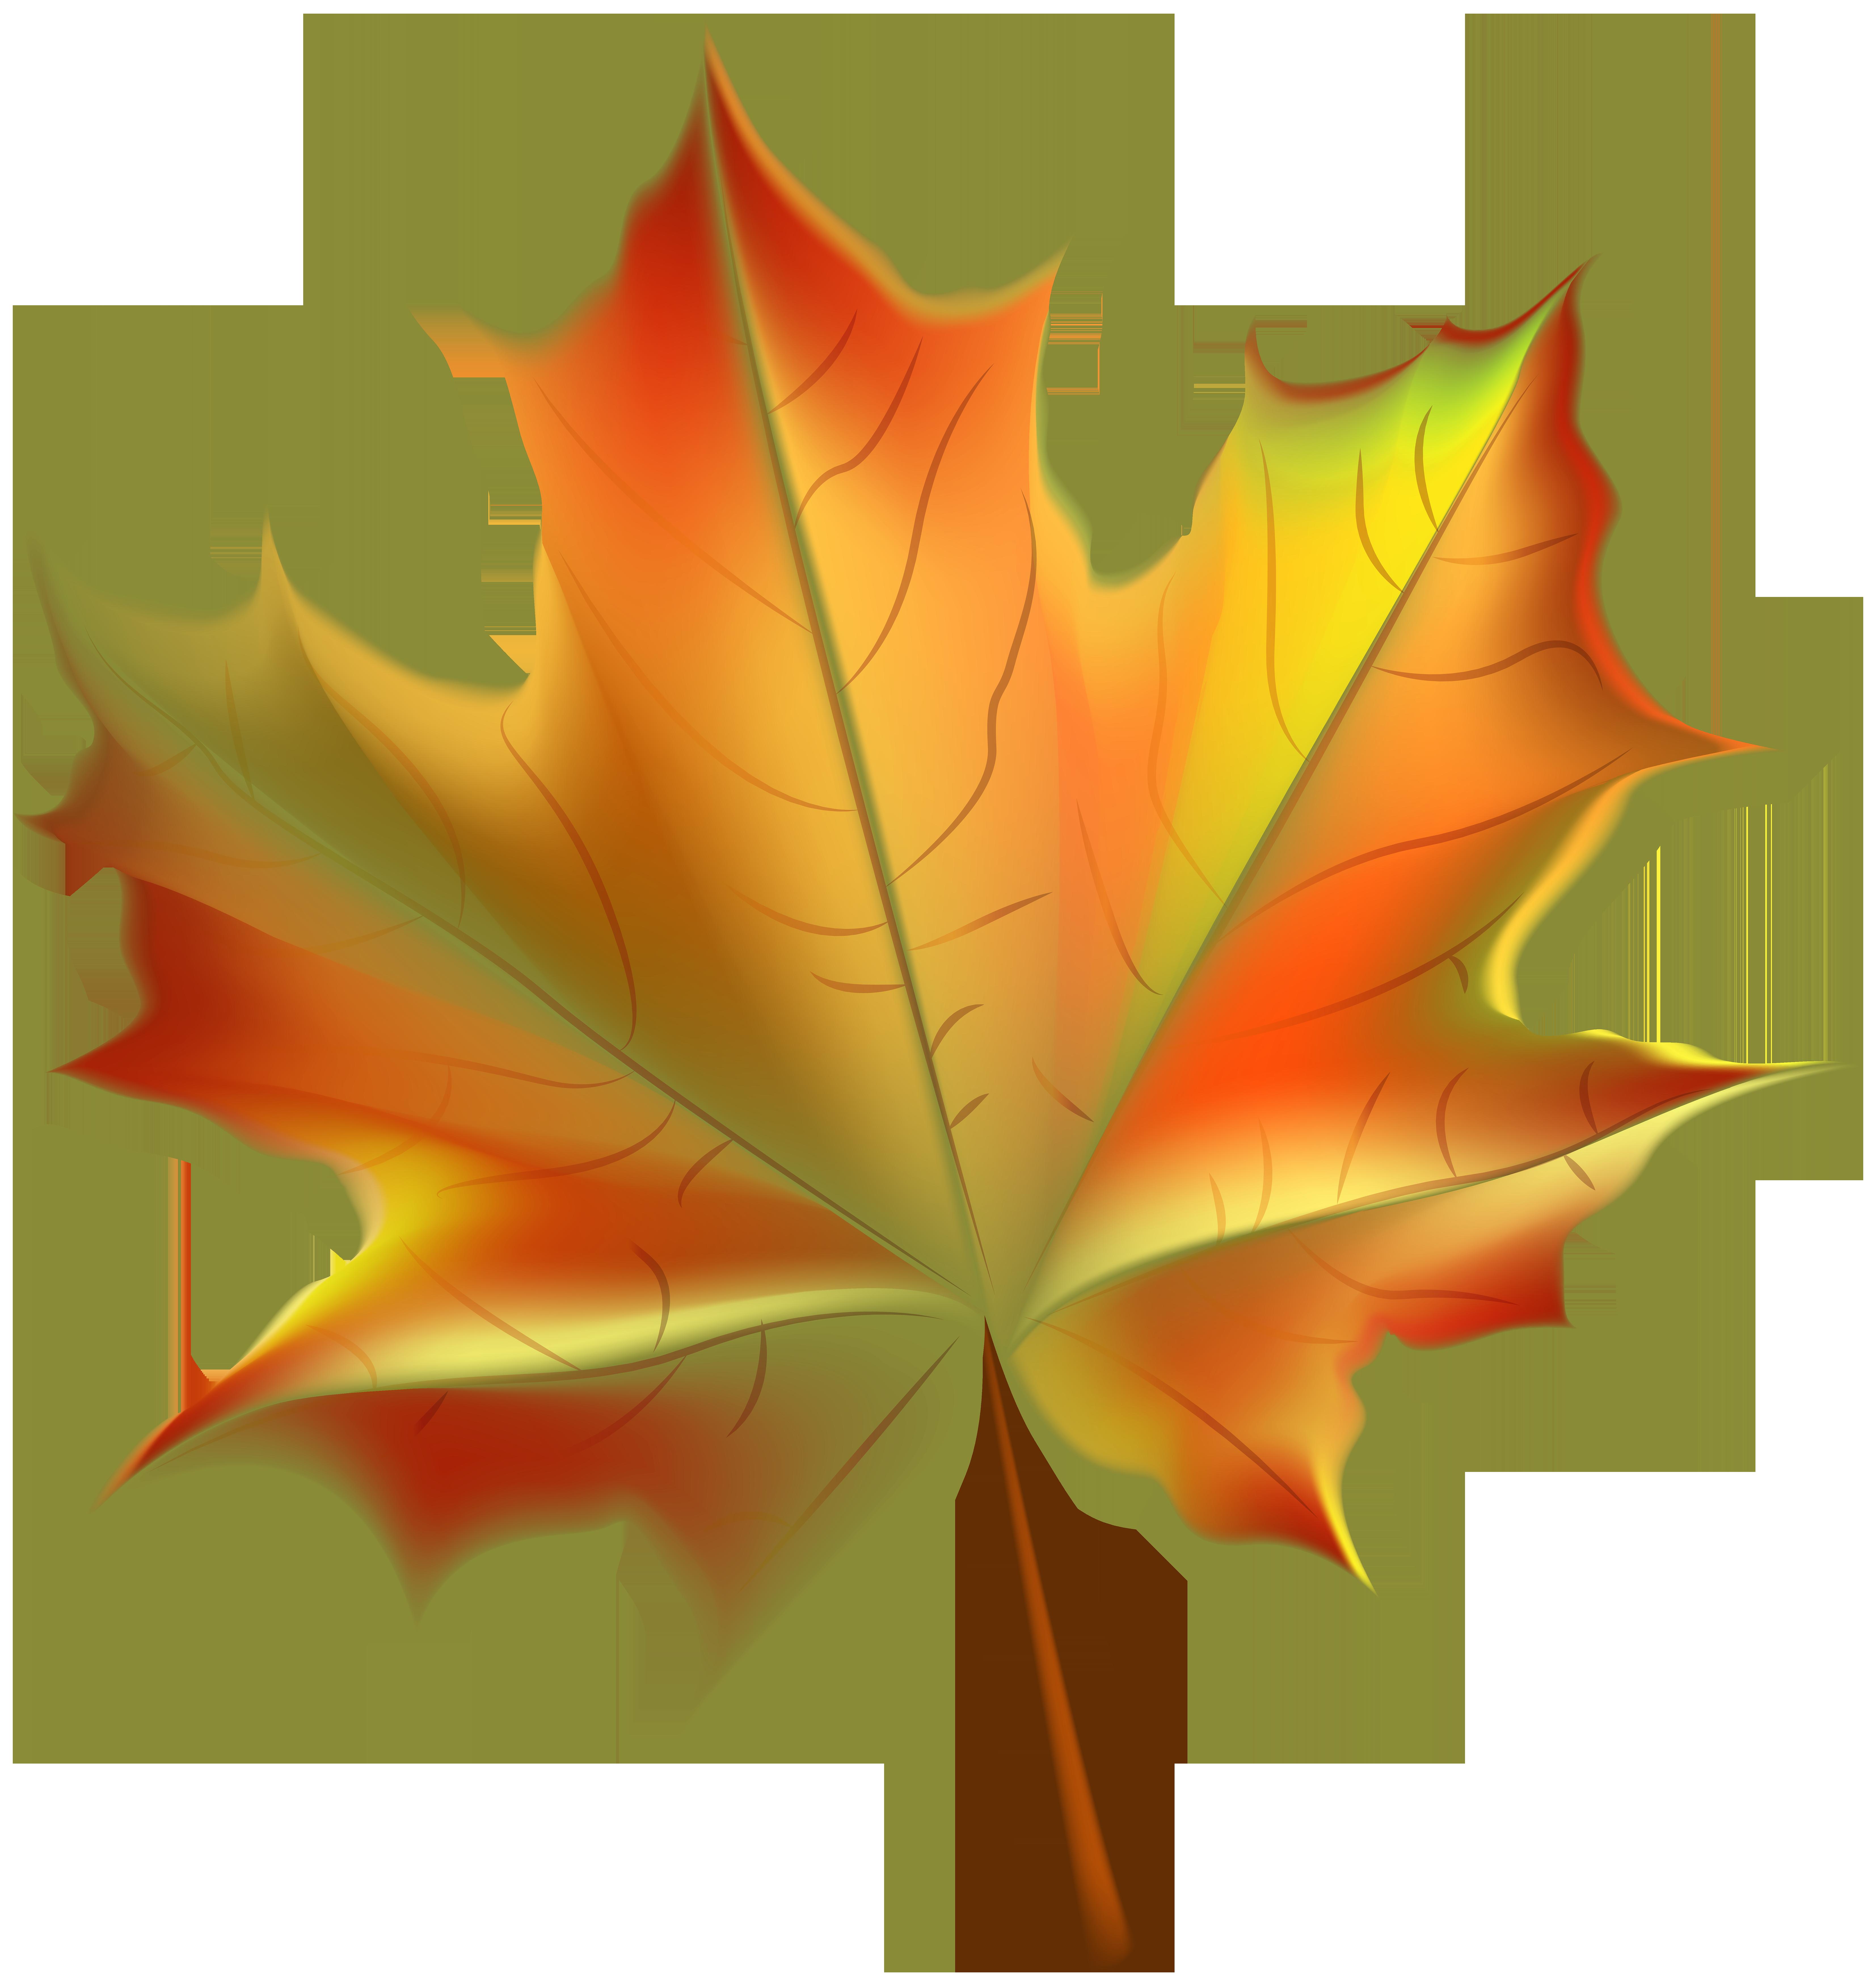 Beautiful Autumn Leaf Transparent PNG Clip Art Image.